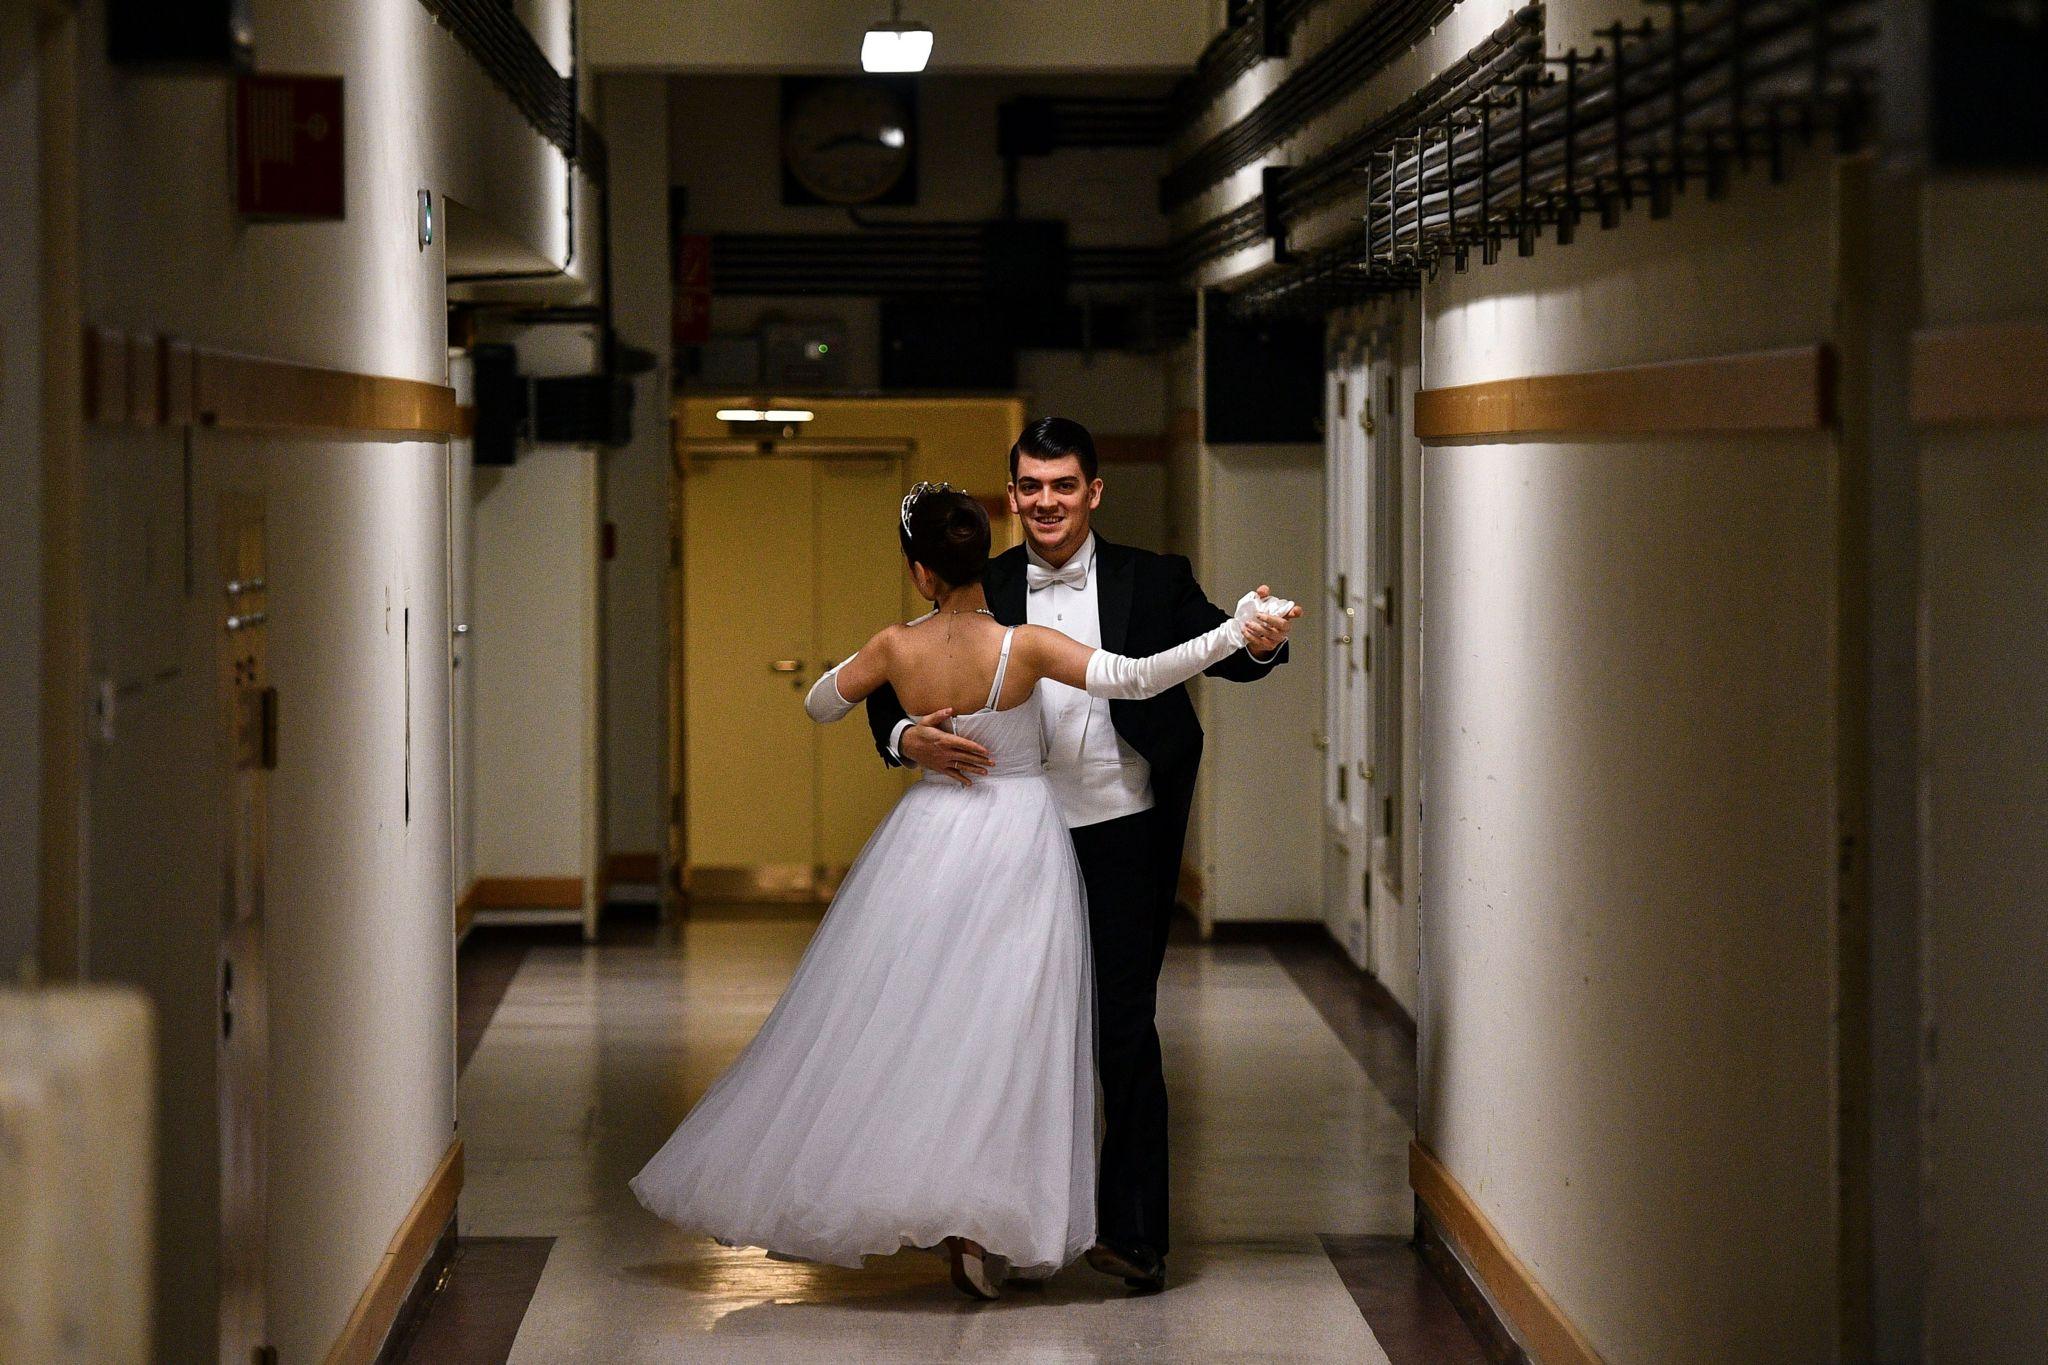 A couple dance backstage